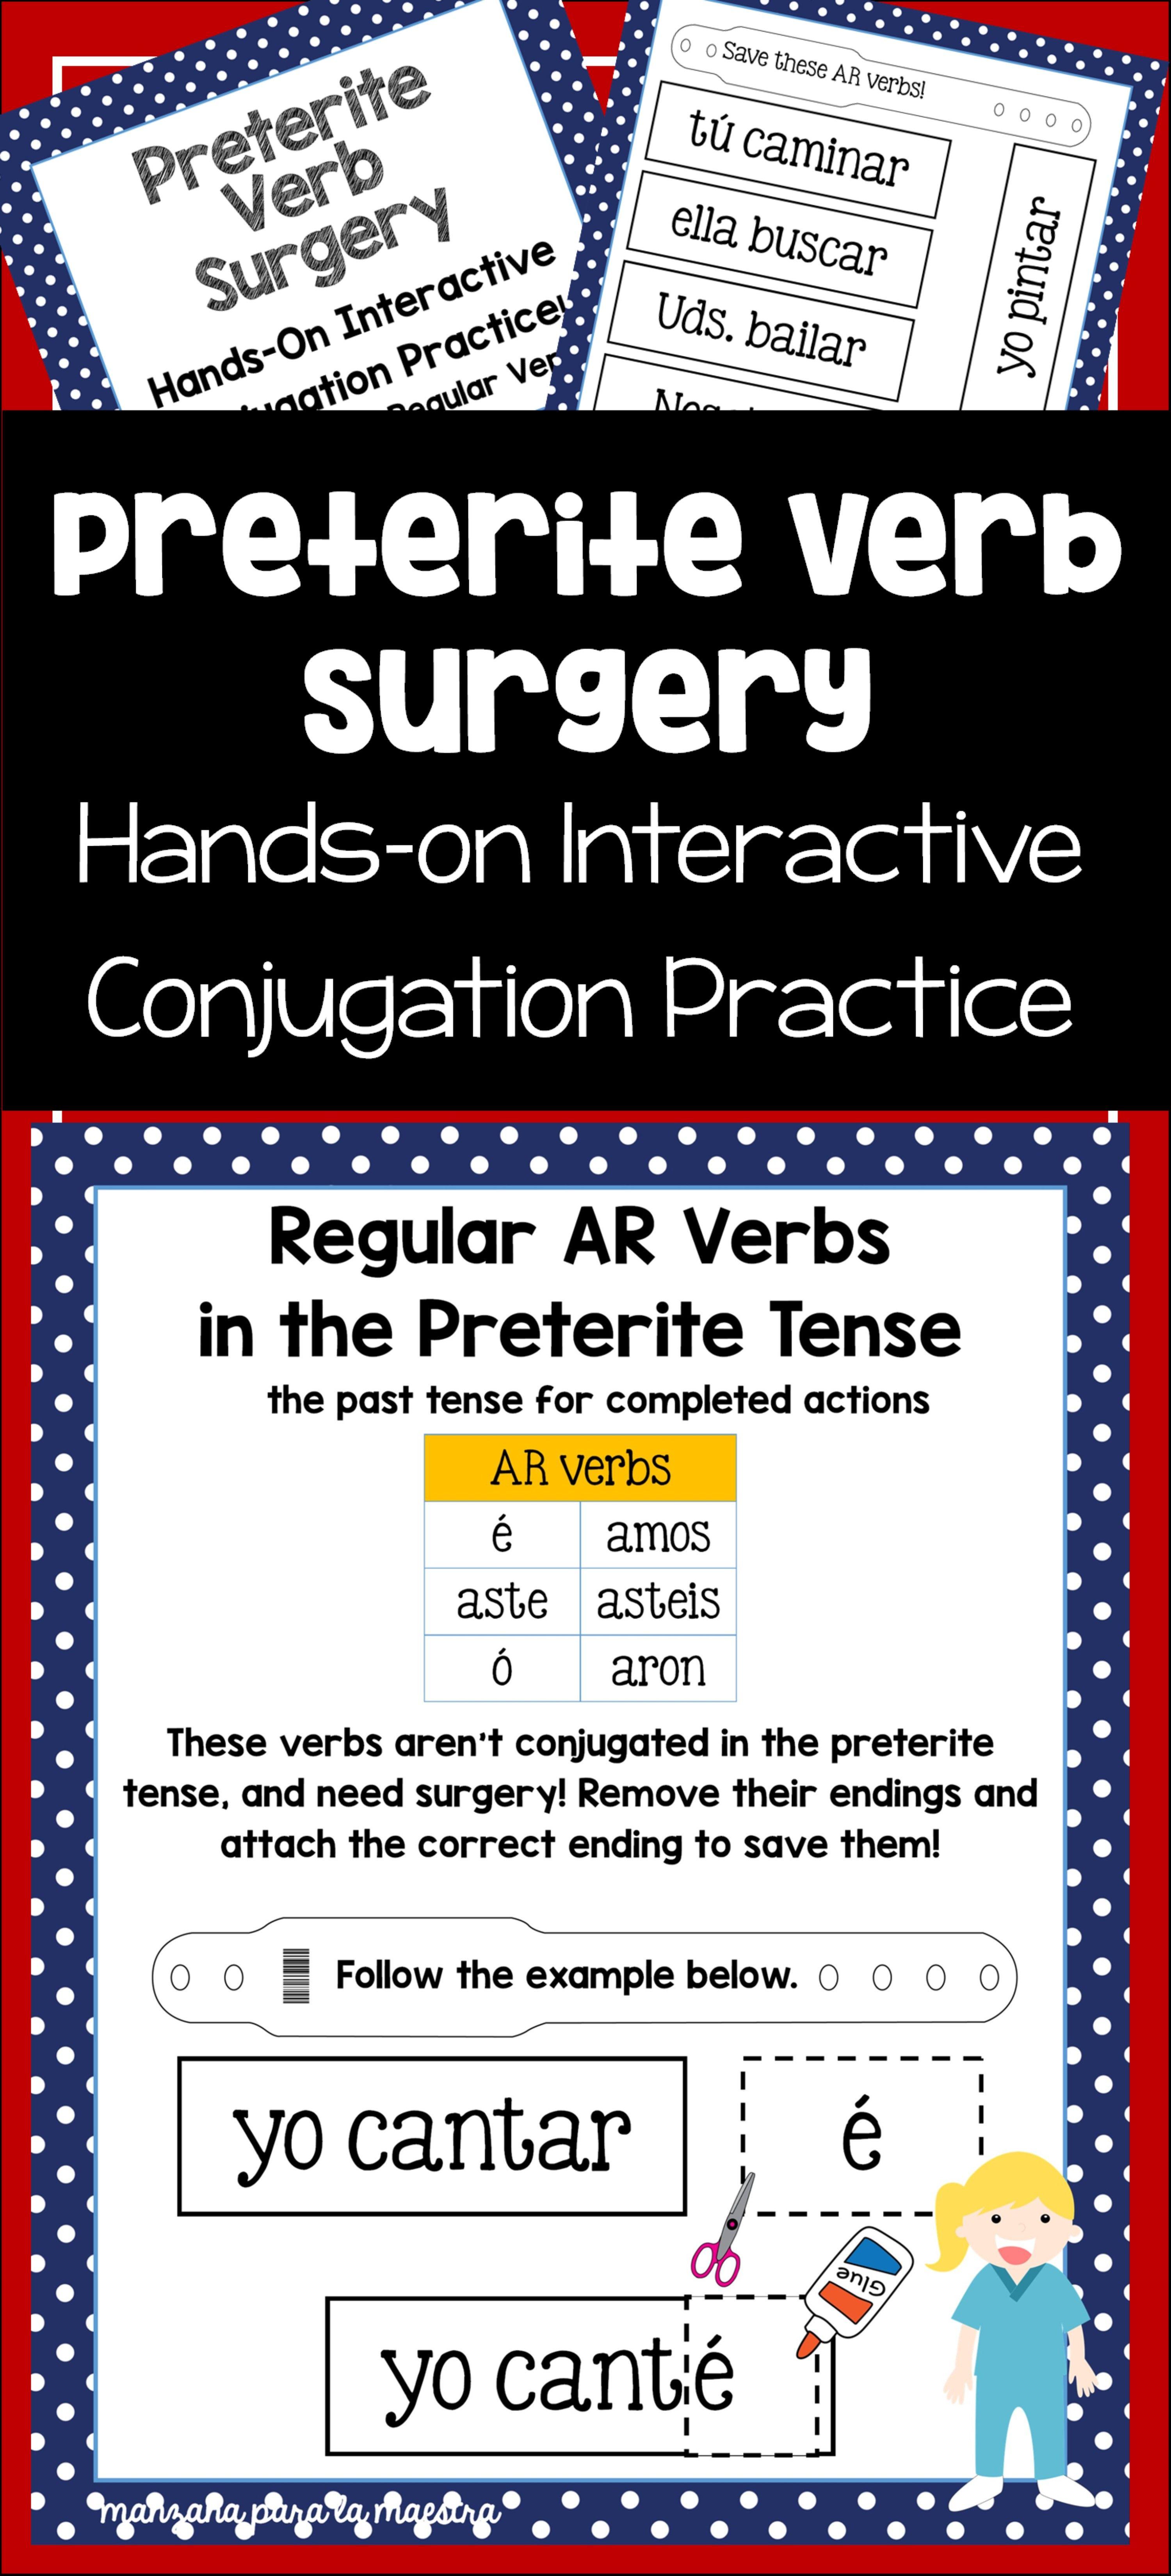 worksheet Regular Preterite Worksheet preterite tense interactive worksheet regular arerir verb surgery